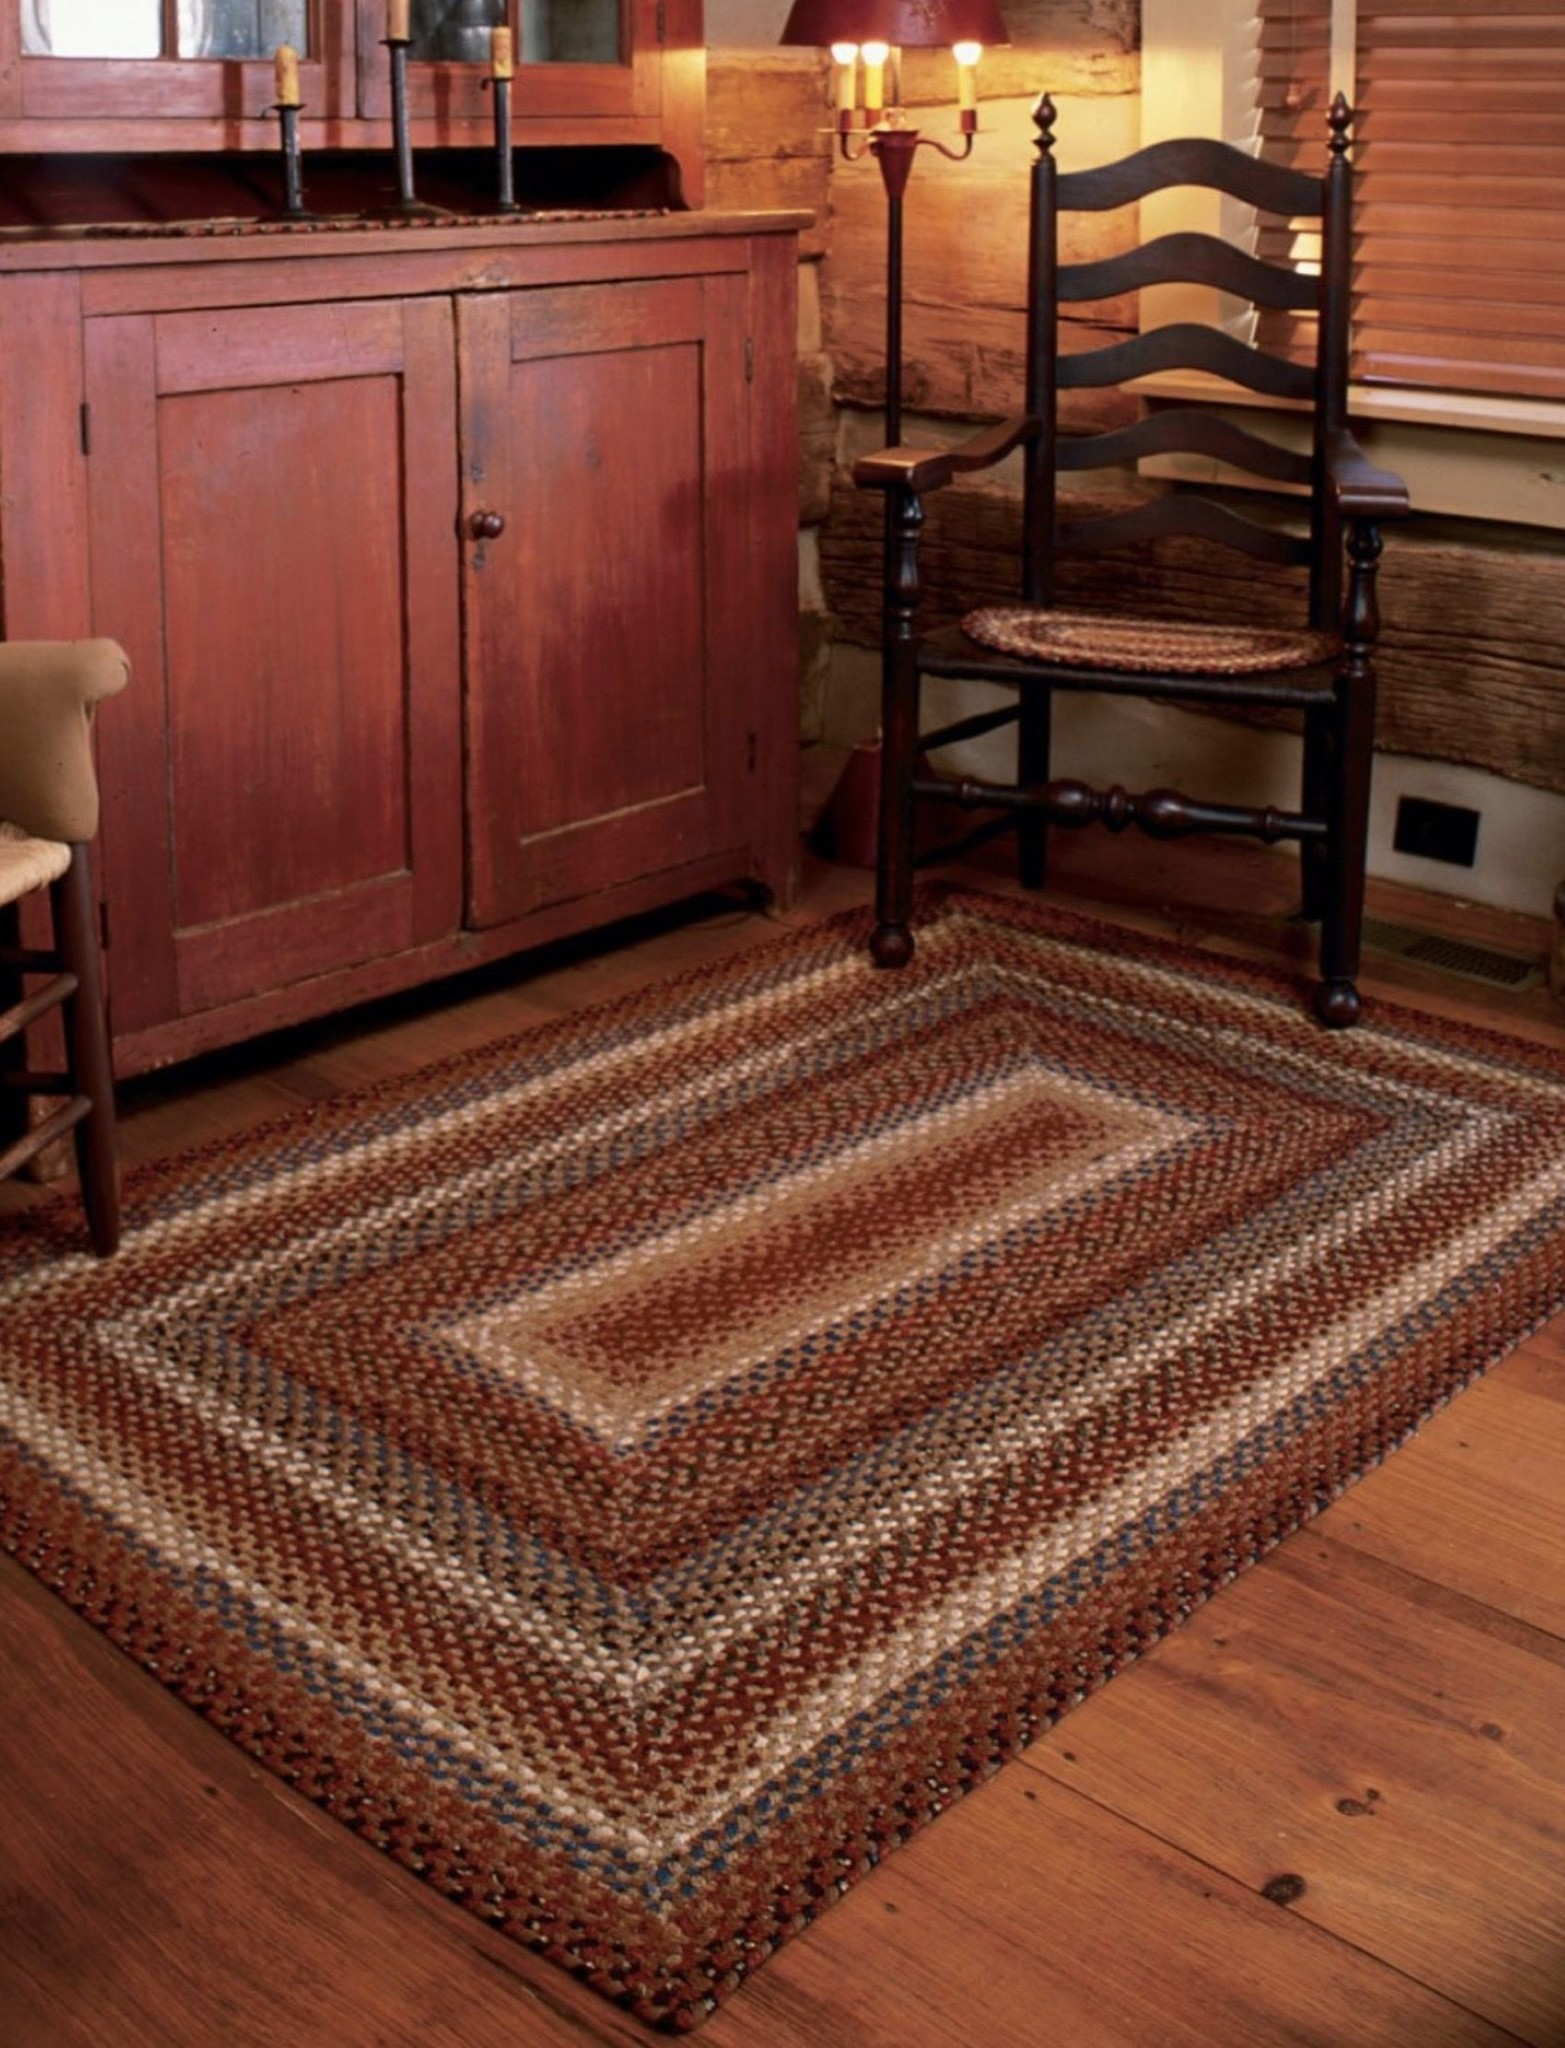 Homespice Decor Biscotti Cotton Braided Rug